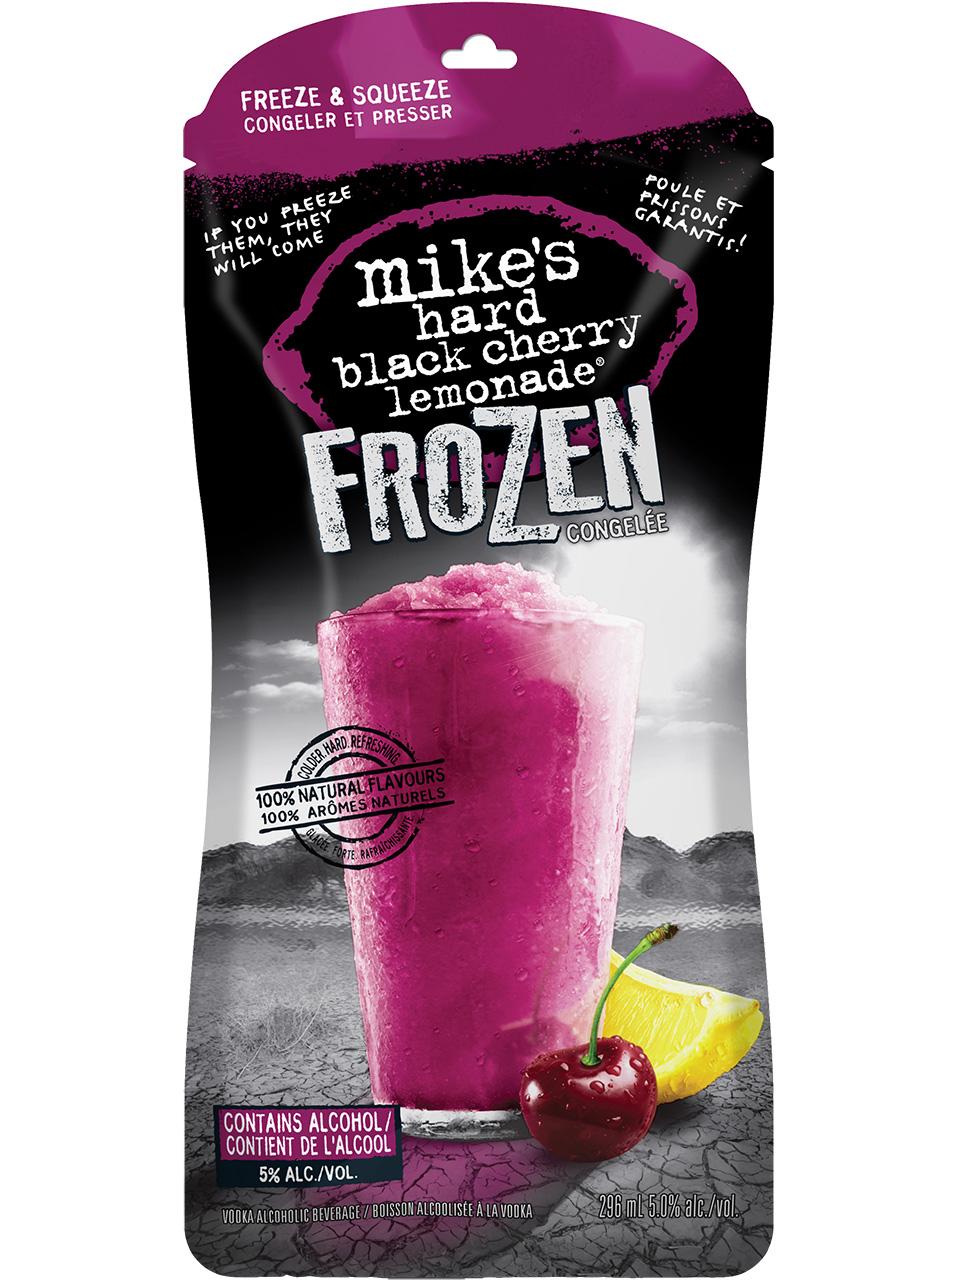 Mike's Hard Frozen Black Cherry Lemonade Pouch